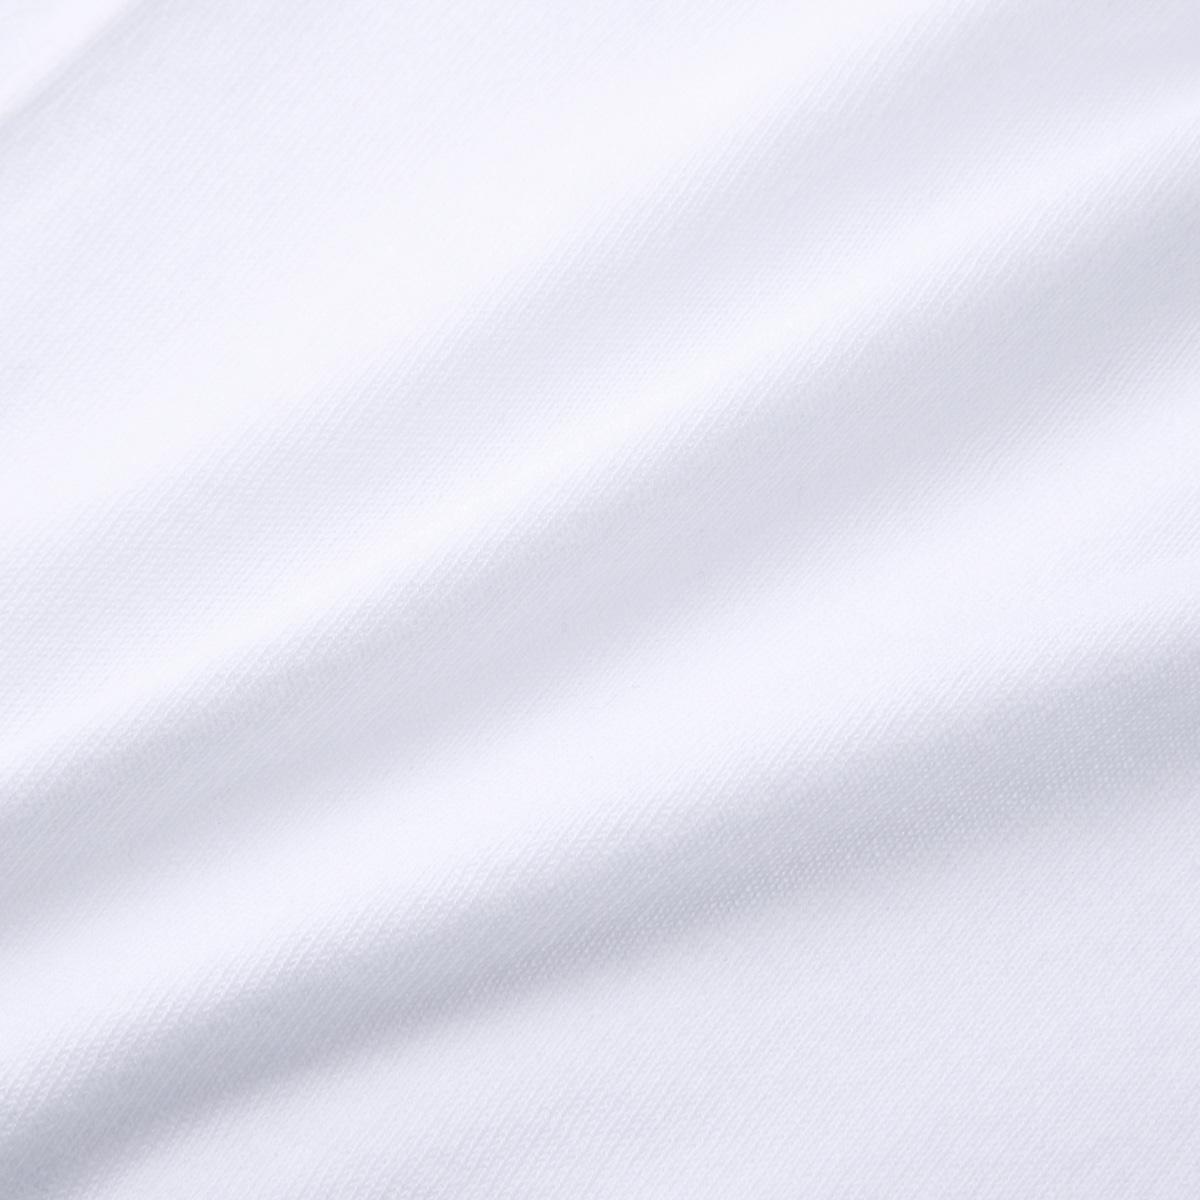 JOHN SMEDLEY ジョンスメドレー ボートネック 七分袖ニット/CASSANDRA 30ゲージ レディース